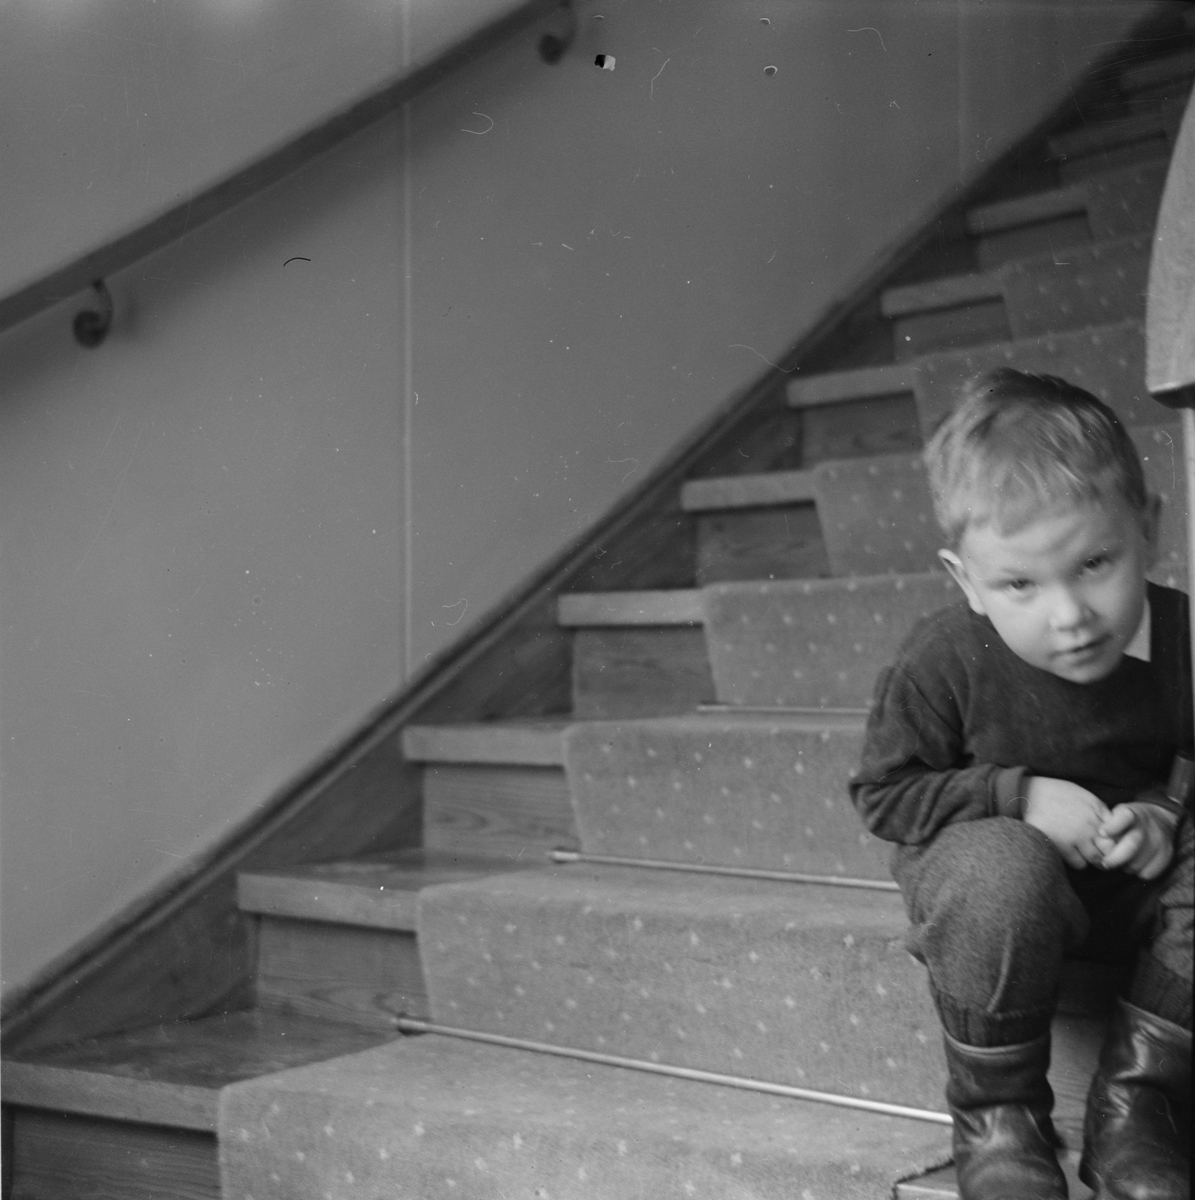 Liten pojke i trappan, Fagerudds Semesterhem, Fagerudd, Uppland 1961